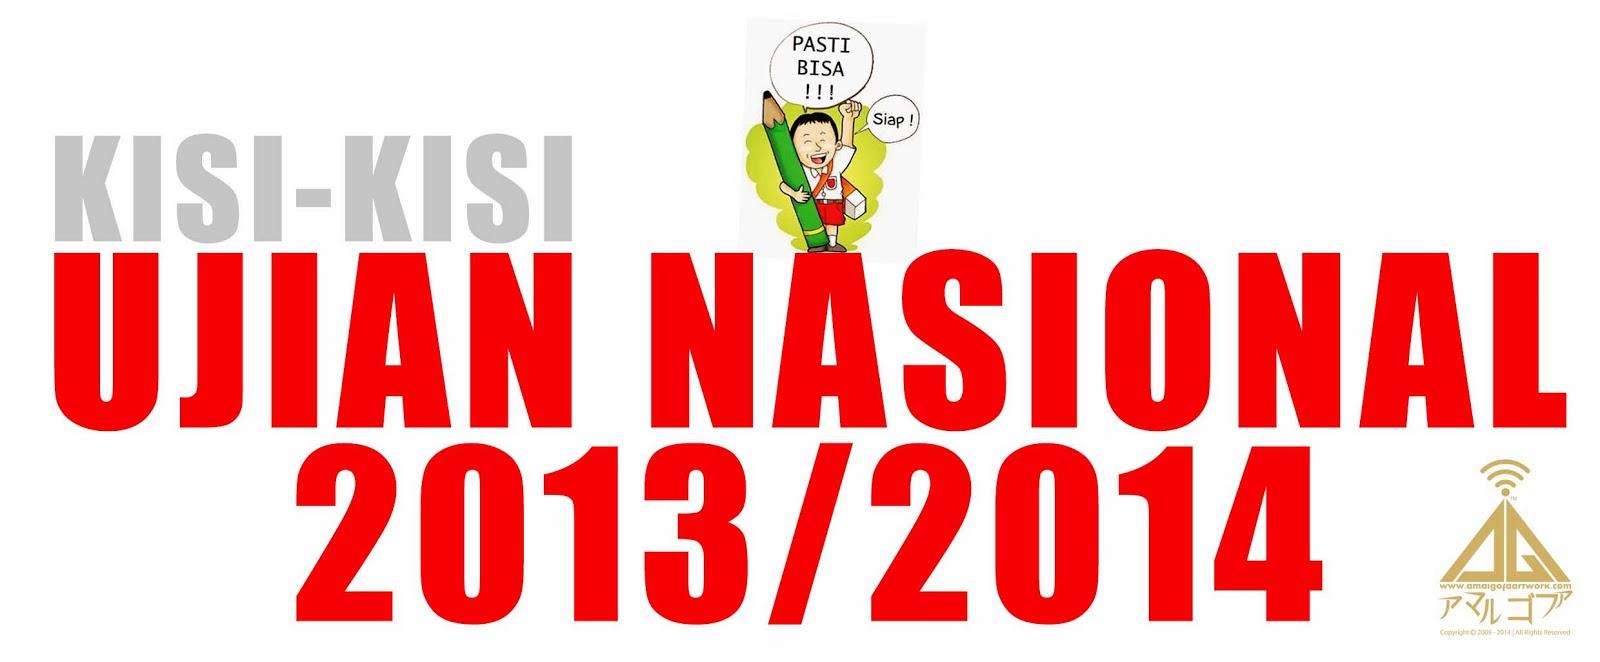 Kisi-kisi ujian nasional 2014